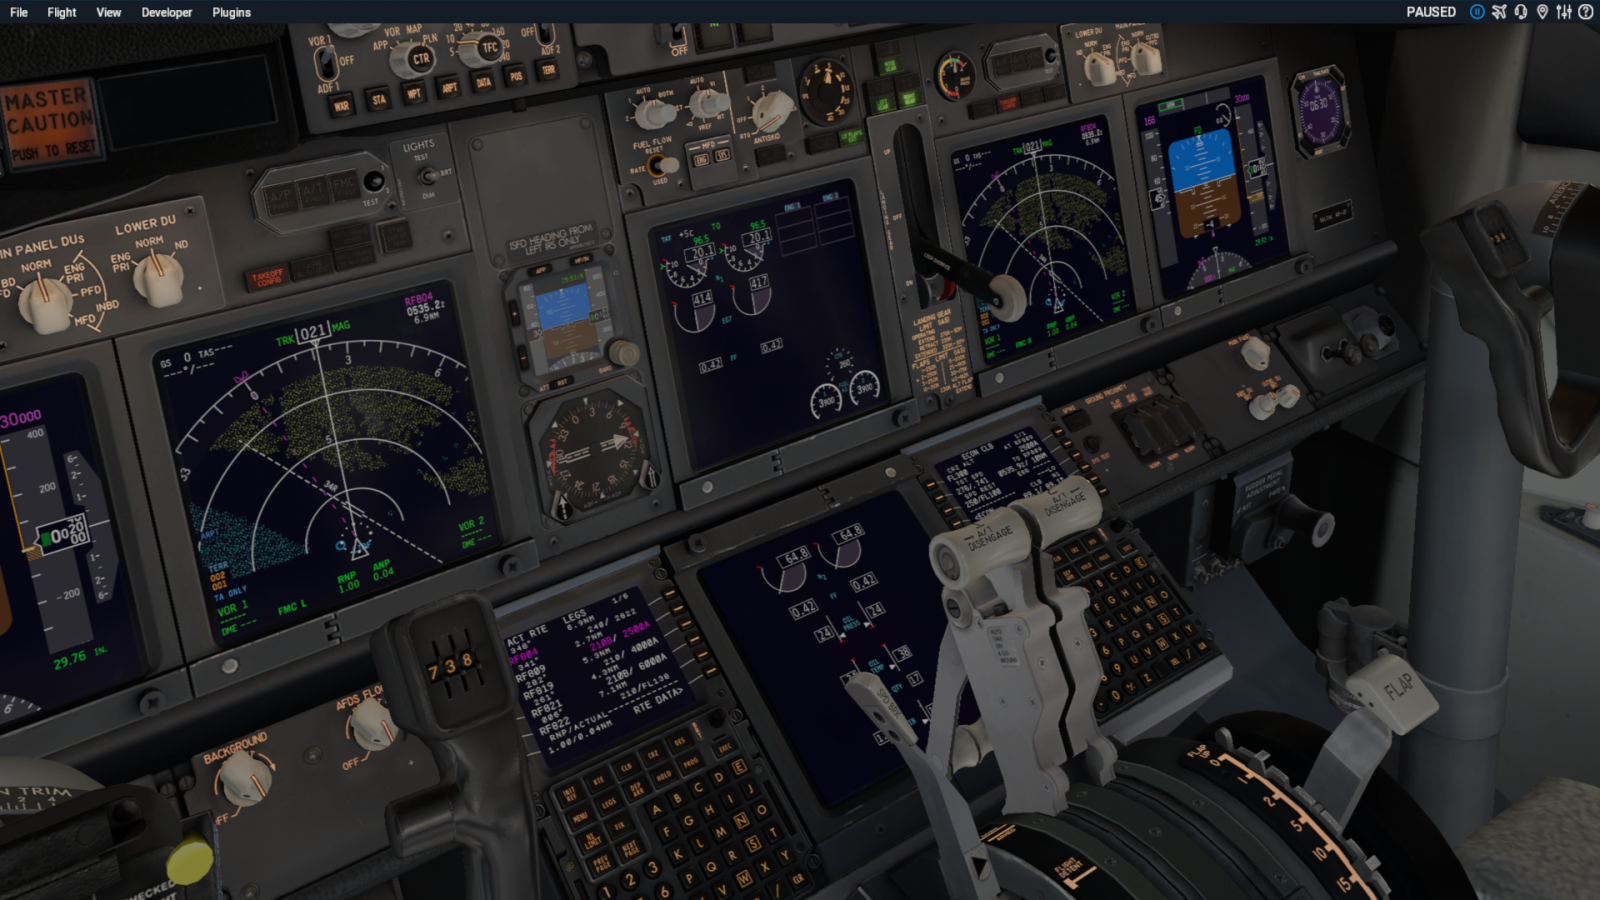 Zibo 738 Thrust Issue - ZIBO B738-800 modified - X-Plane Org Forum